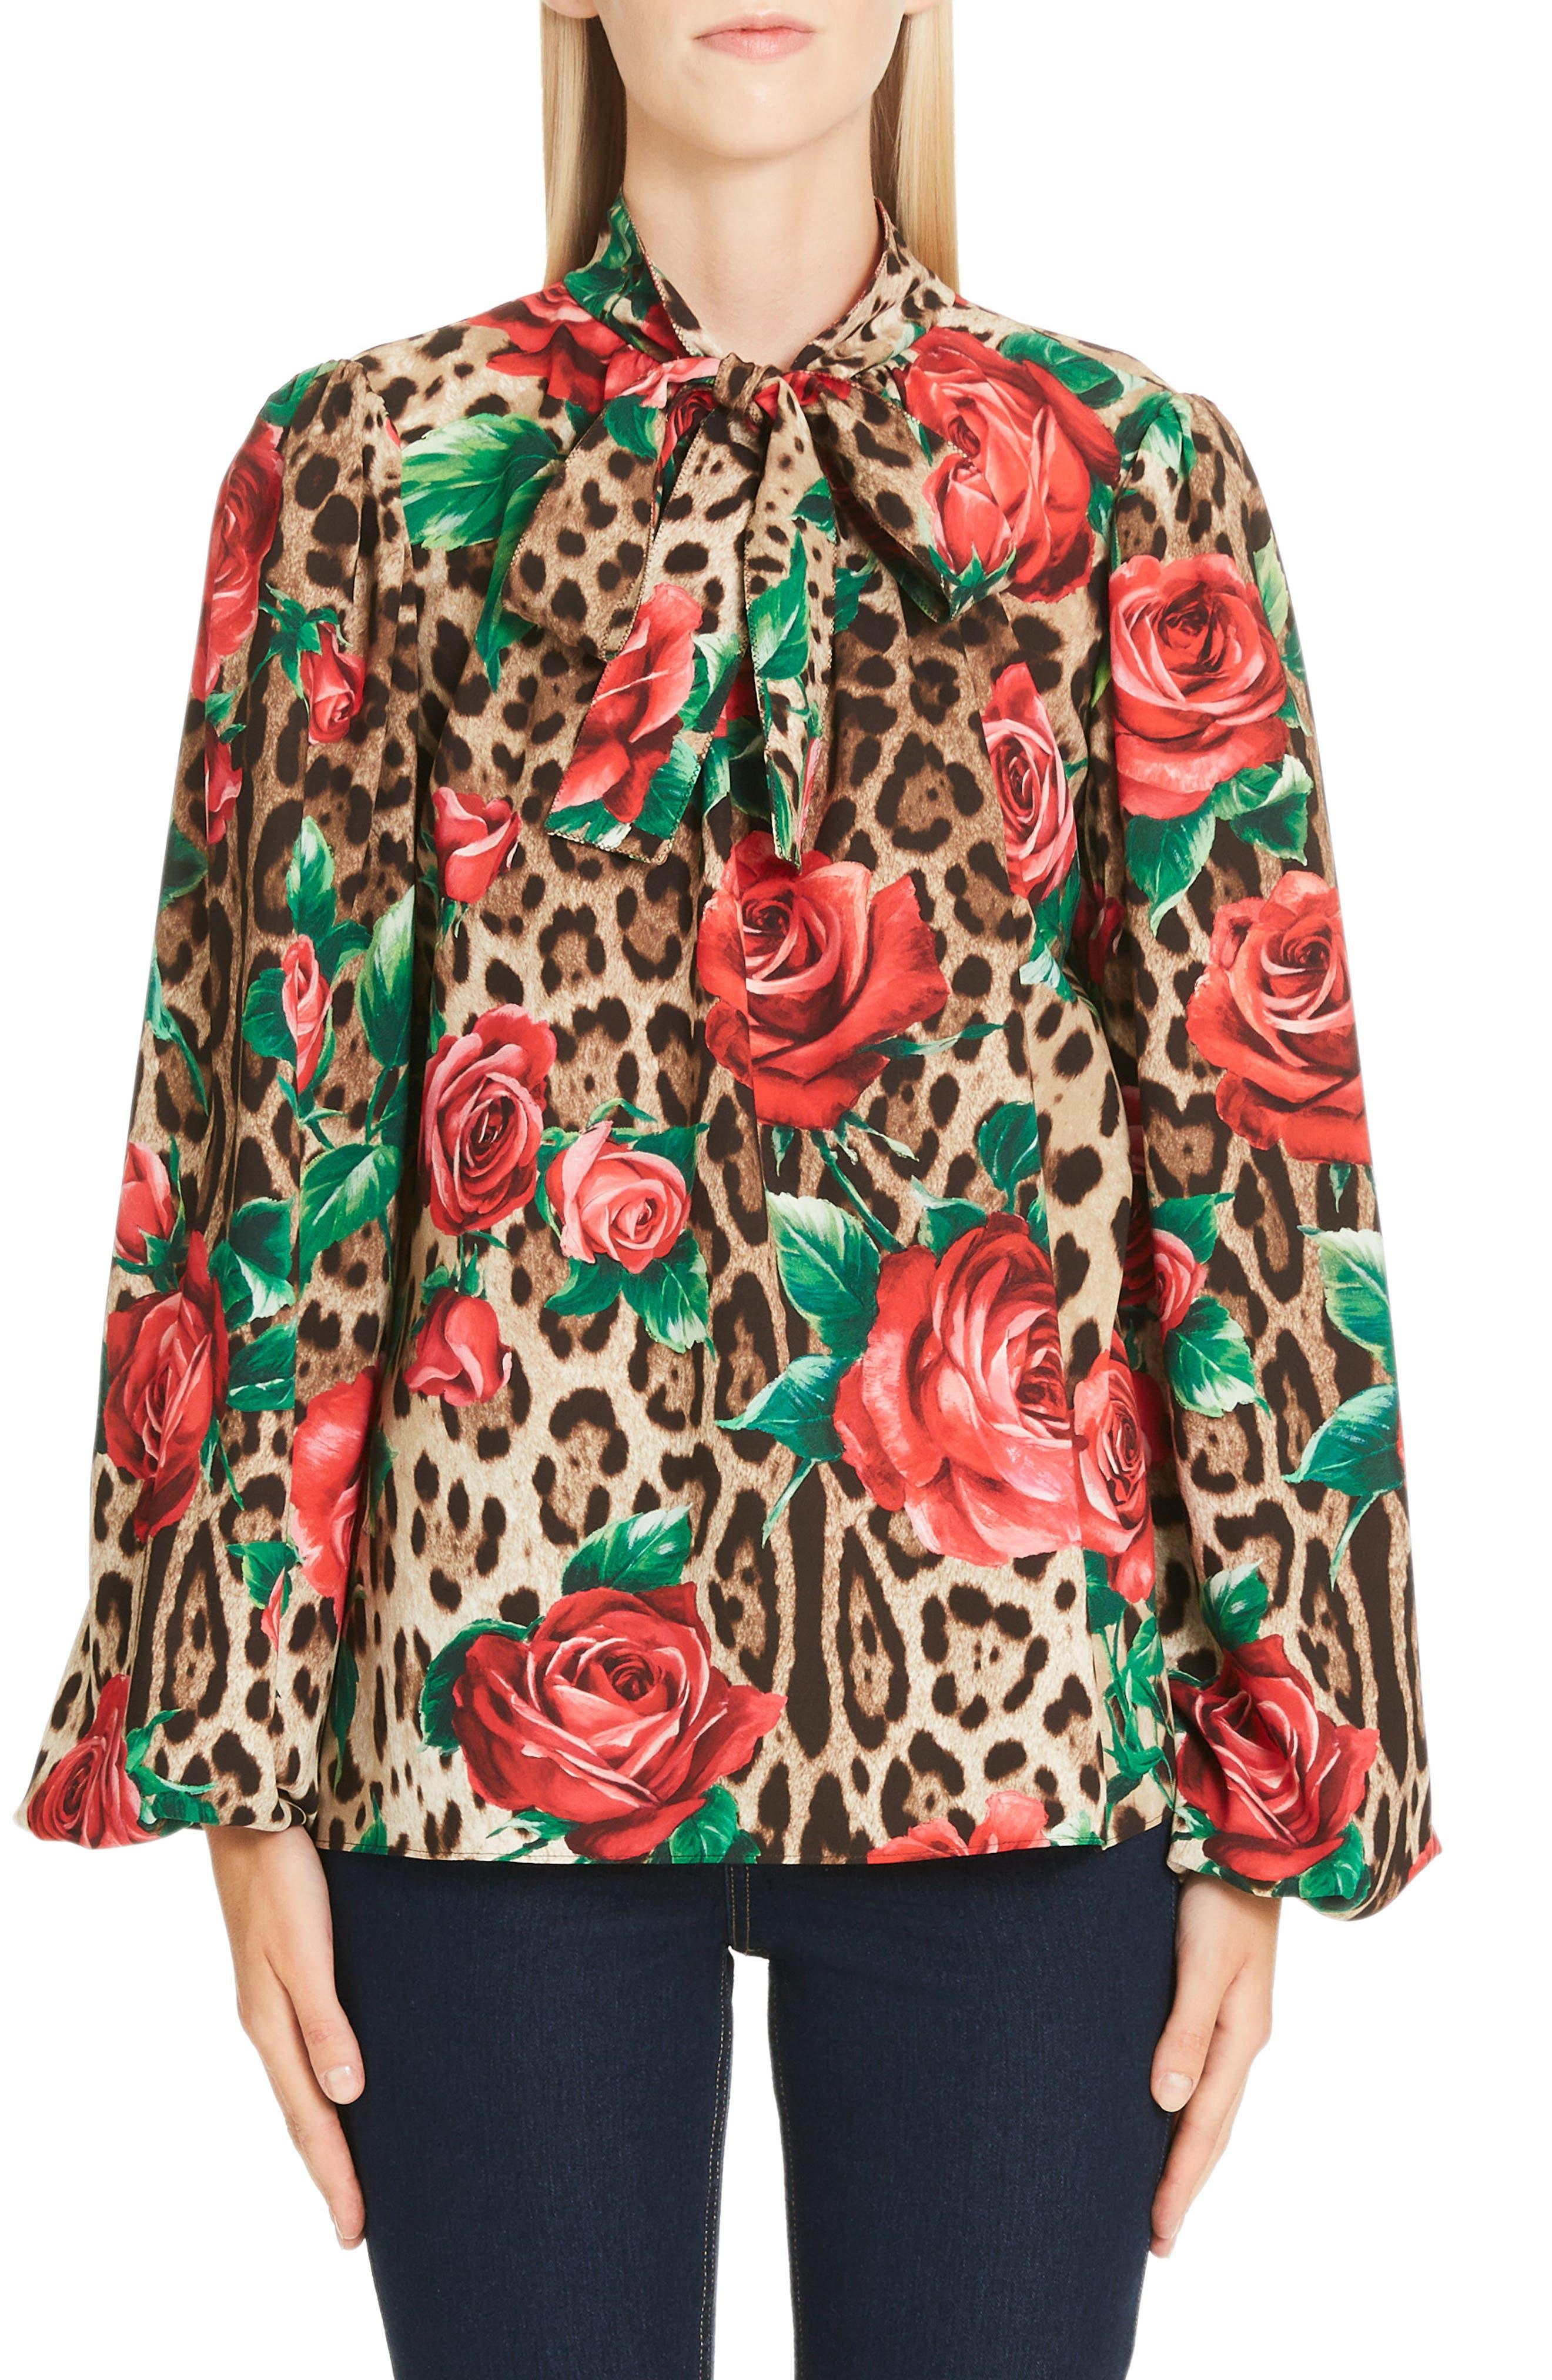 Rose & Leopard Print Tie Neck Stretch Silk Blouse, Main, color, HKIRS ROSE LEO